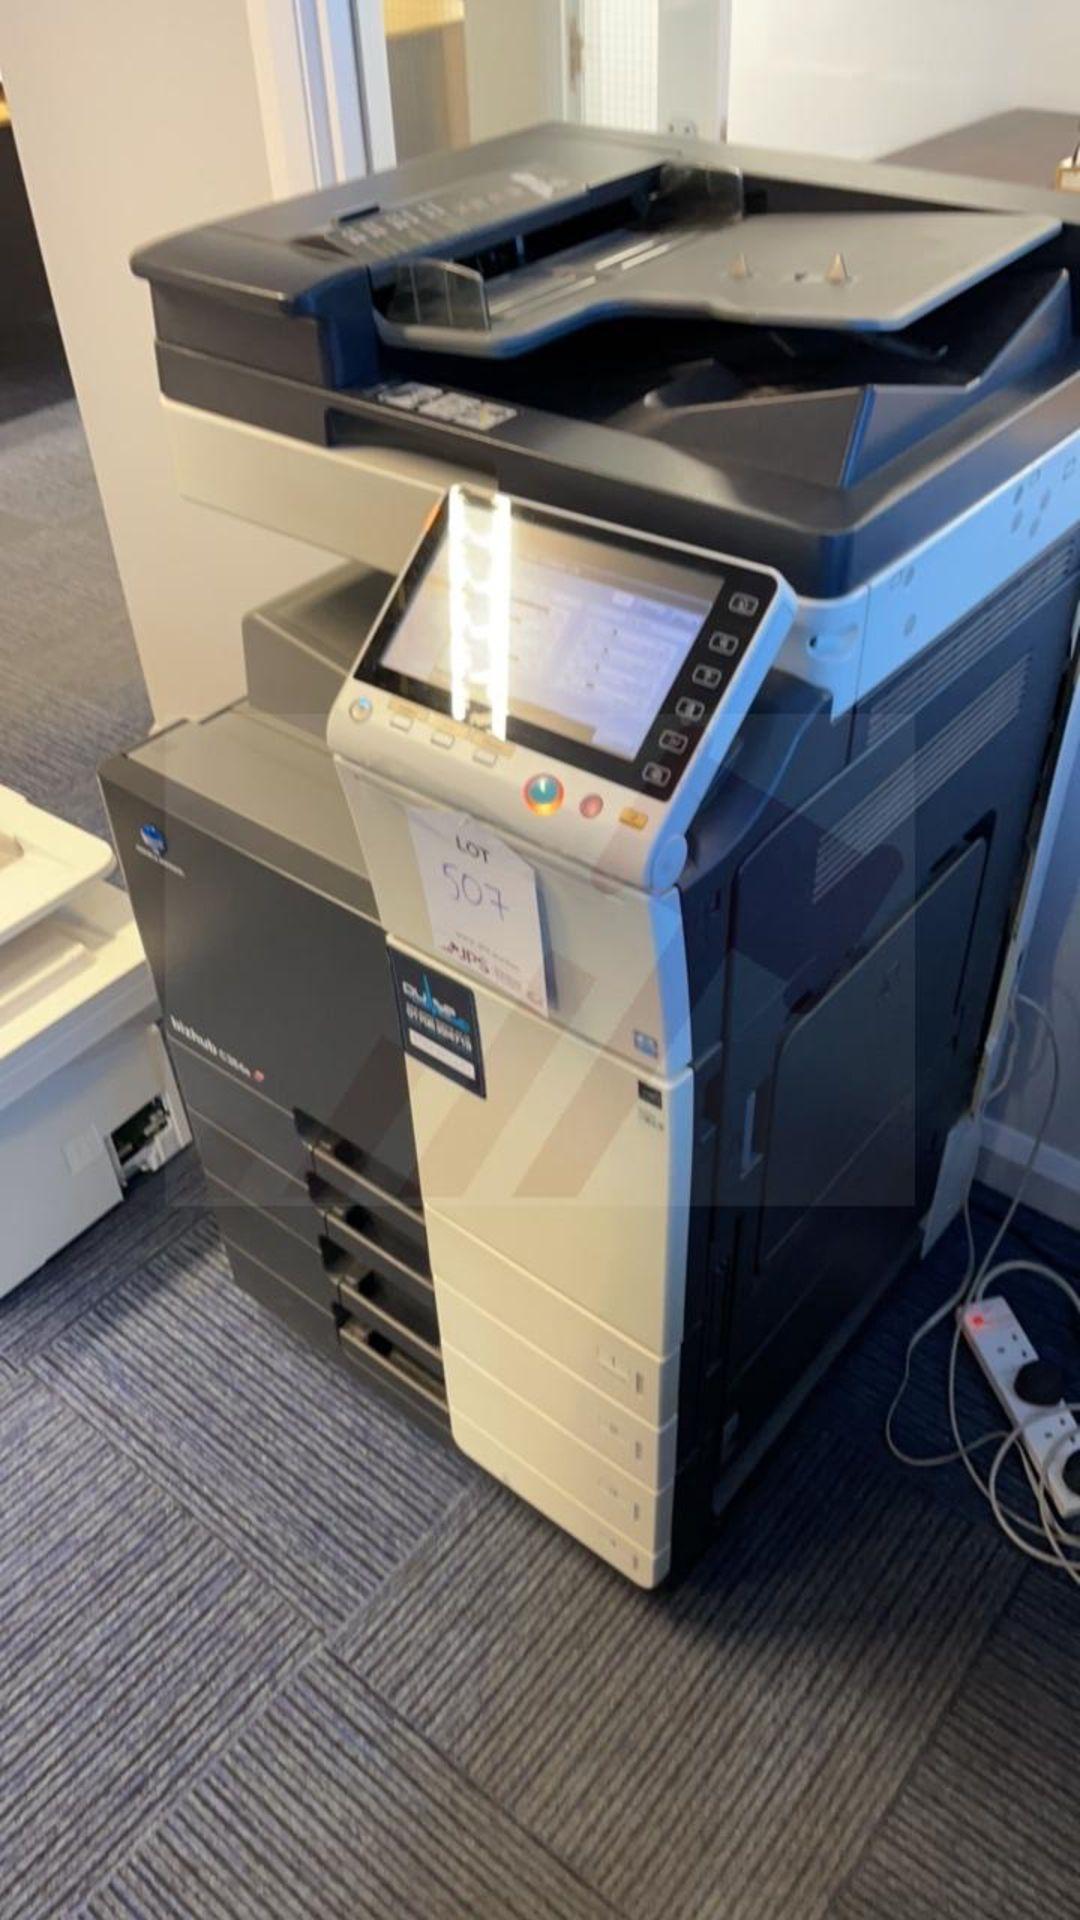 Konica Minolta Bizhub C364E A3 Multi-Functional Printer - Image 6 of 6